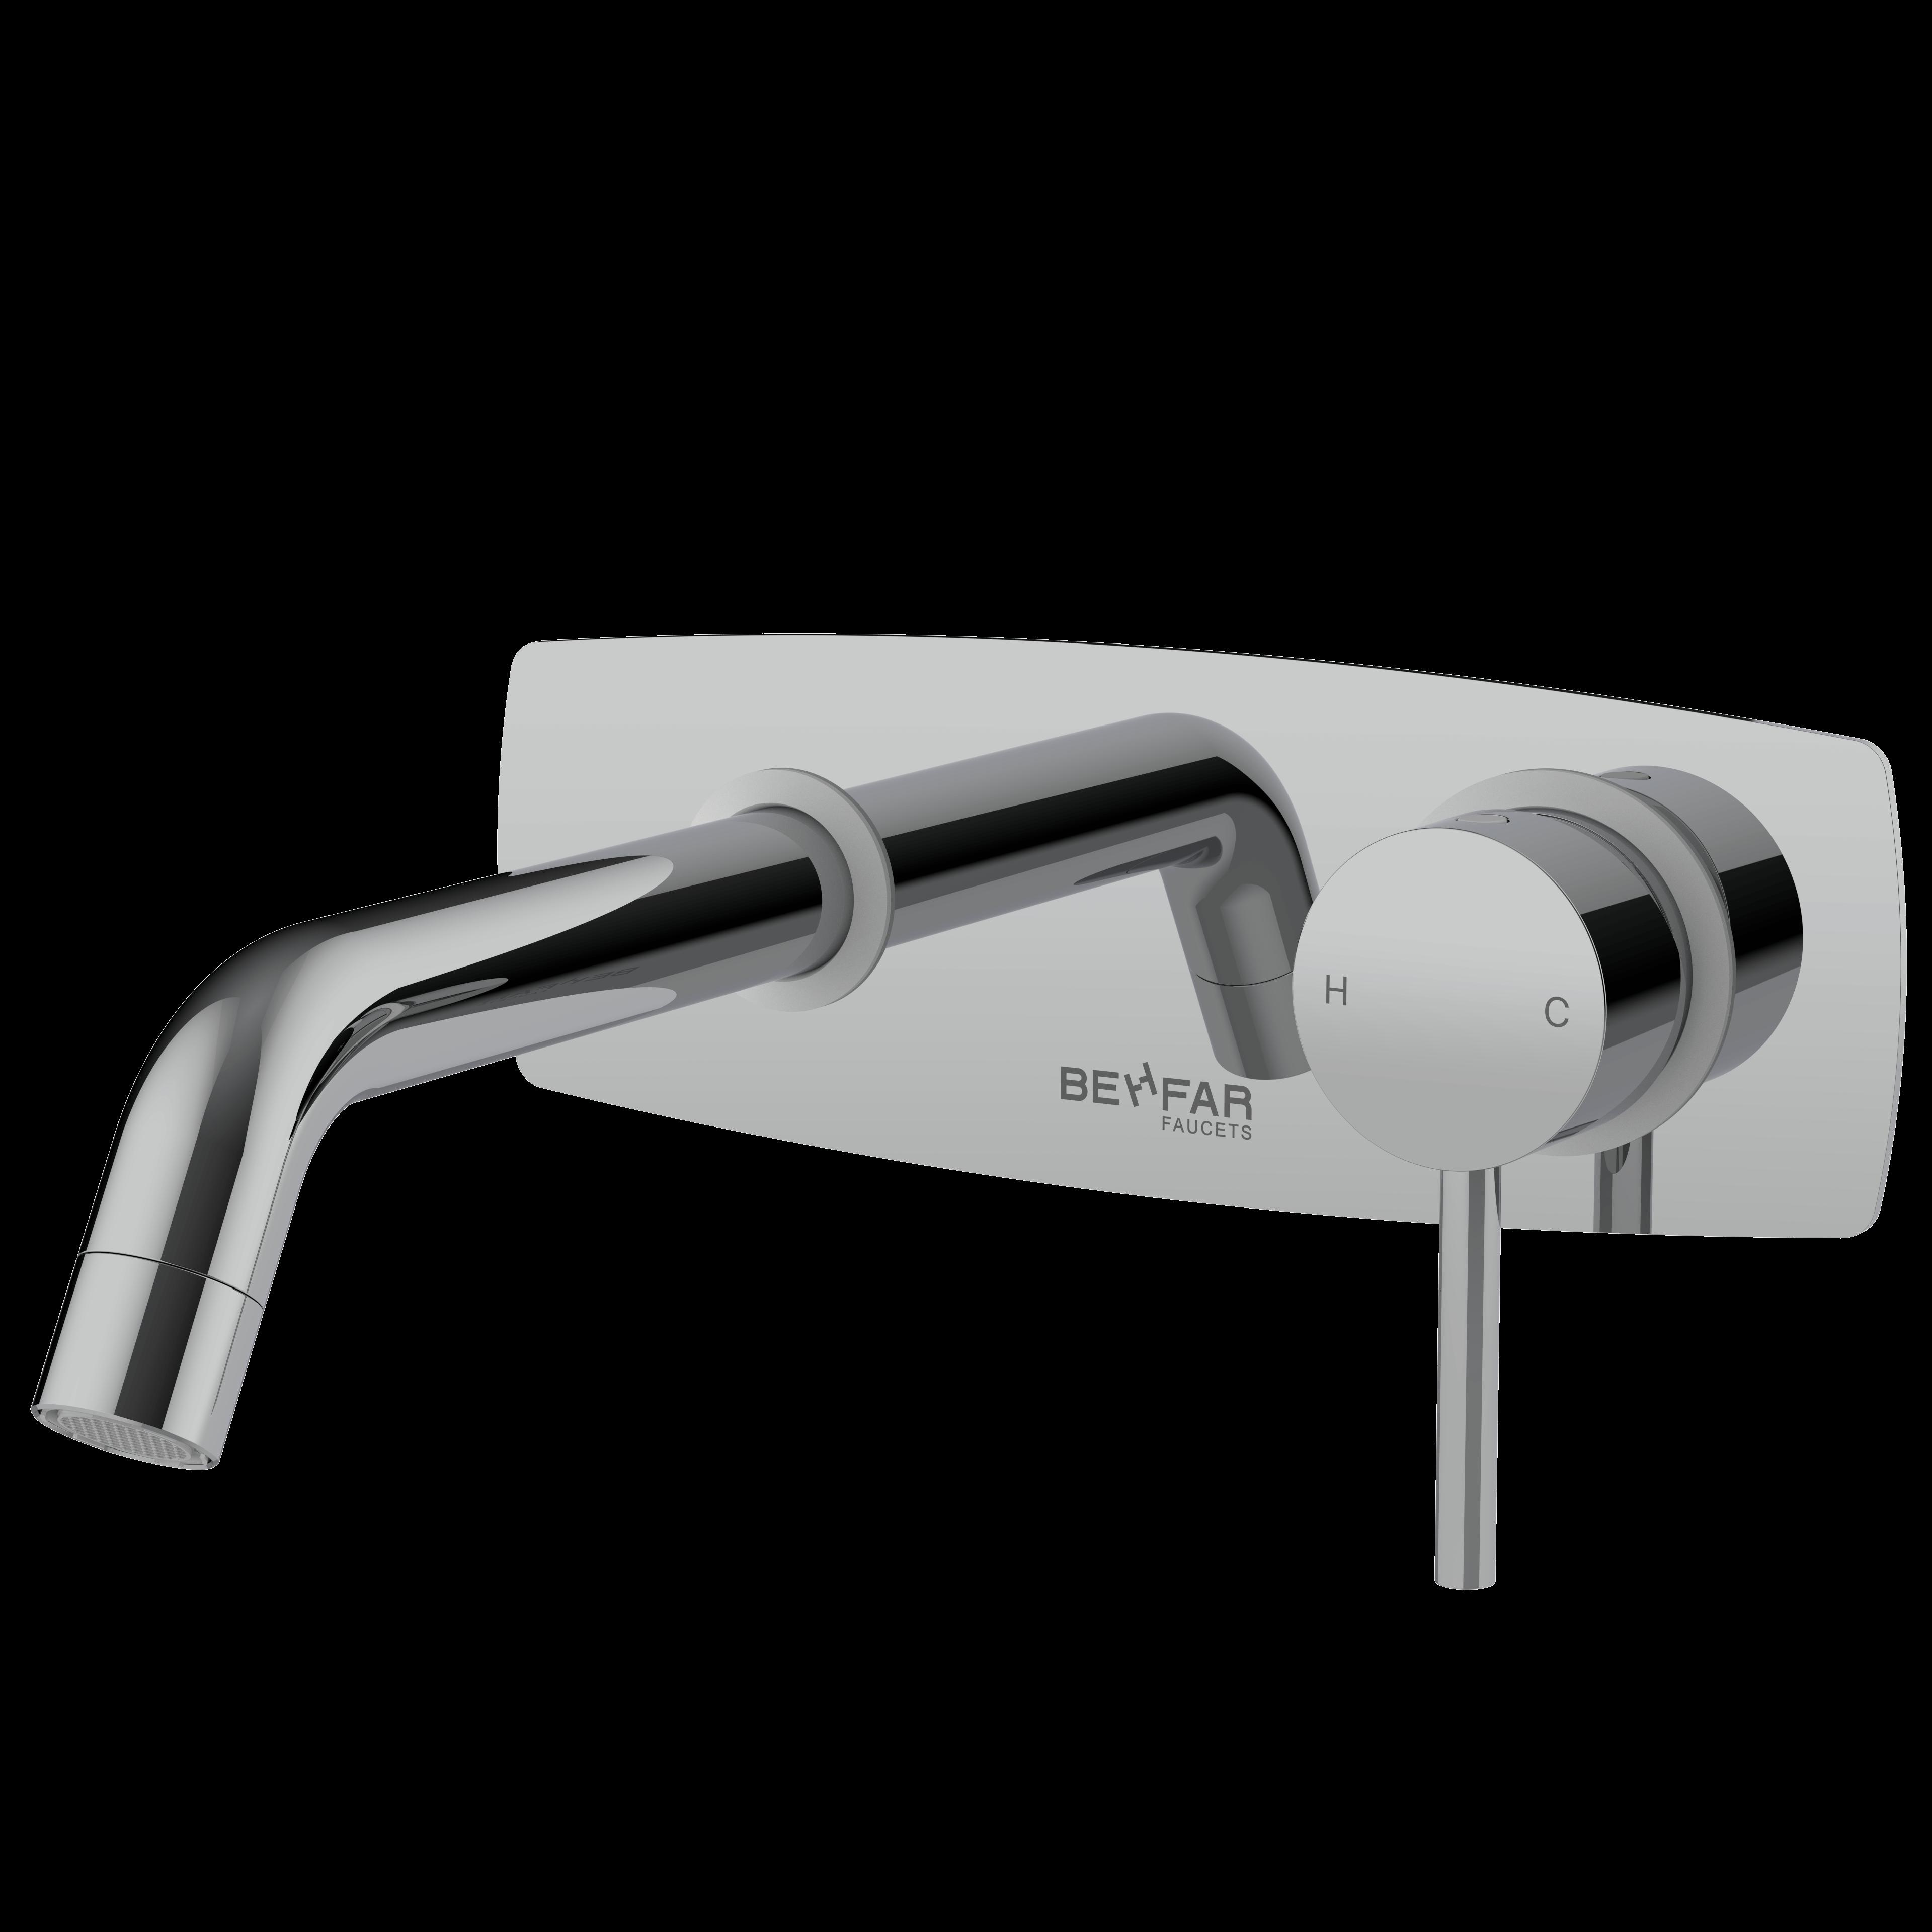 behfar shiny chrome basin concealed with bracket plate y